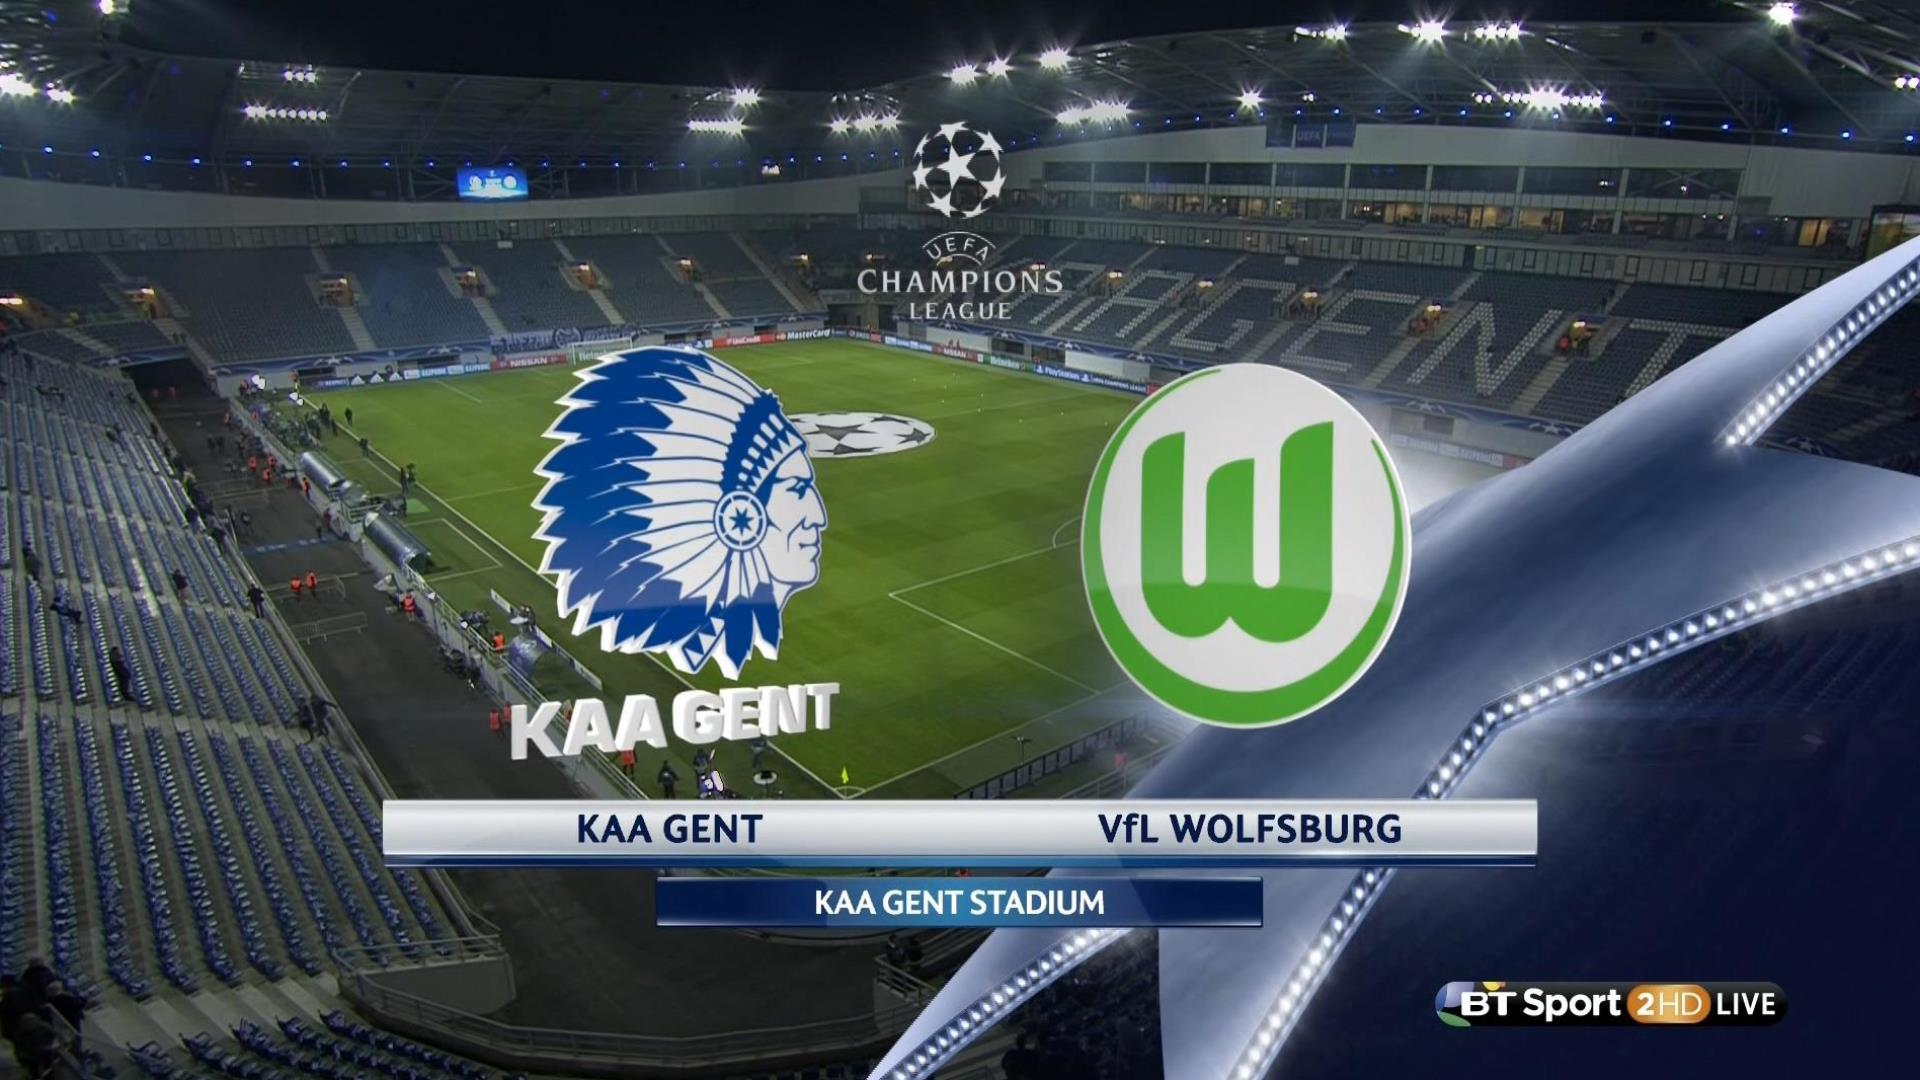 Futbol Ucl 201516 R16 1st Leg Kaa Gent V Vfl Wolfsburg